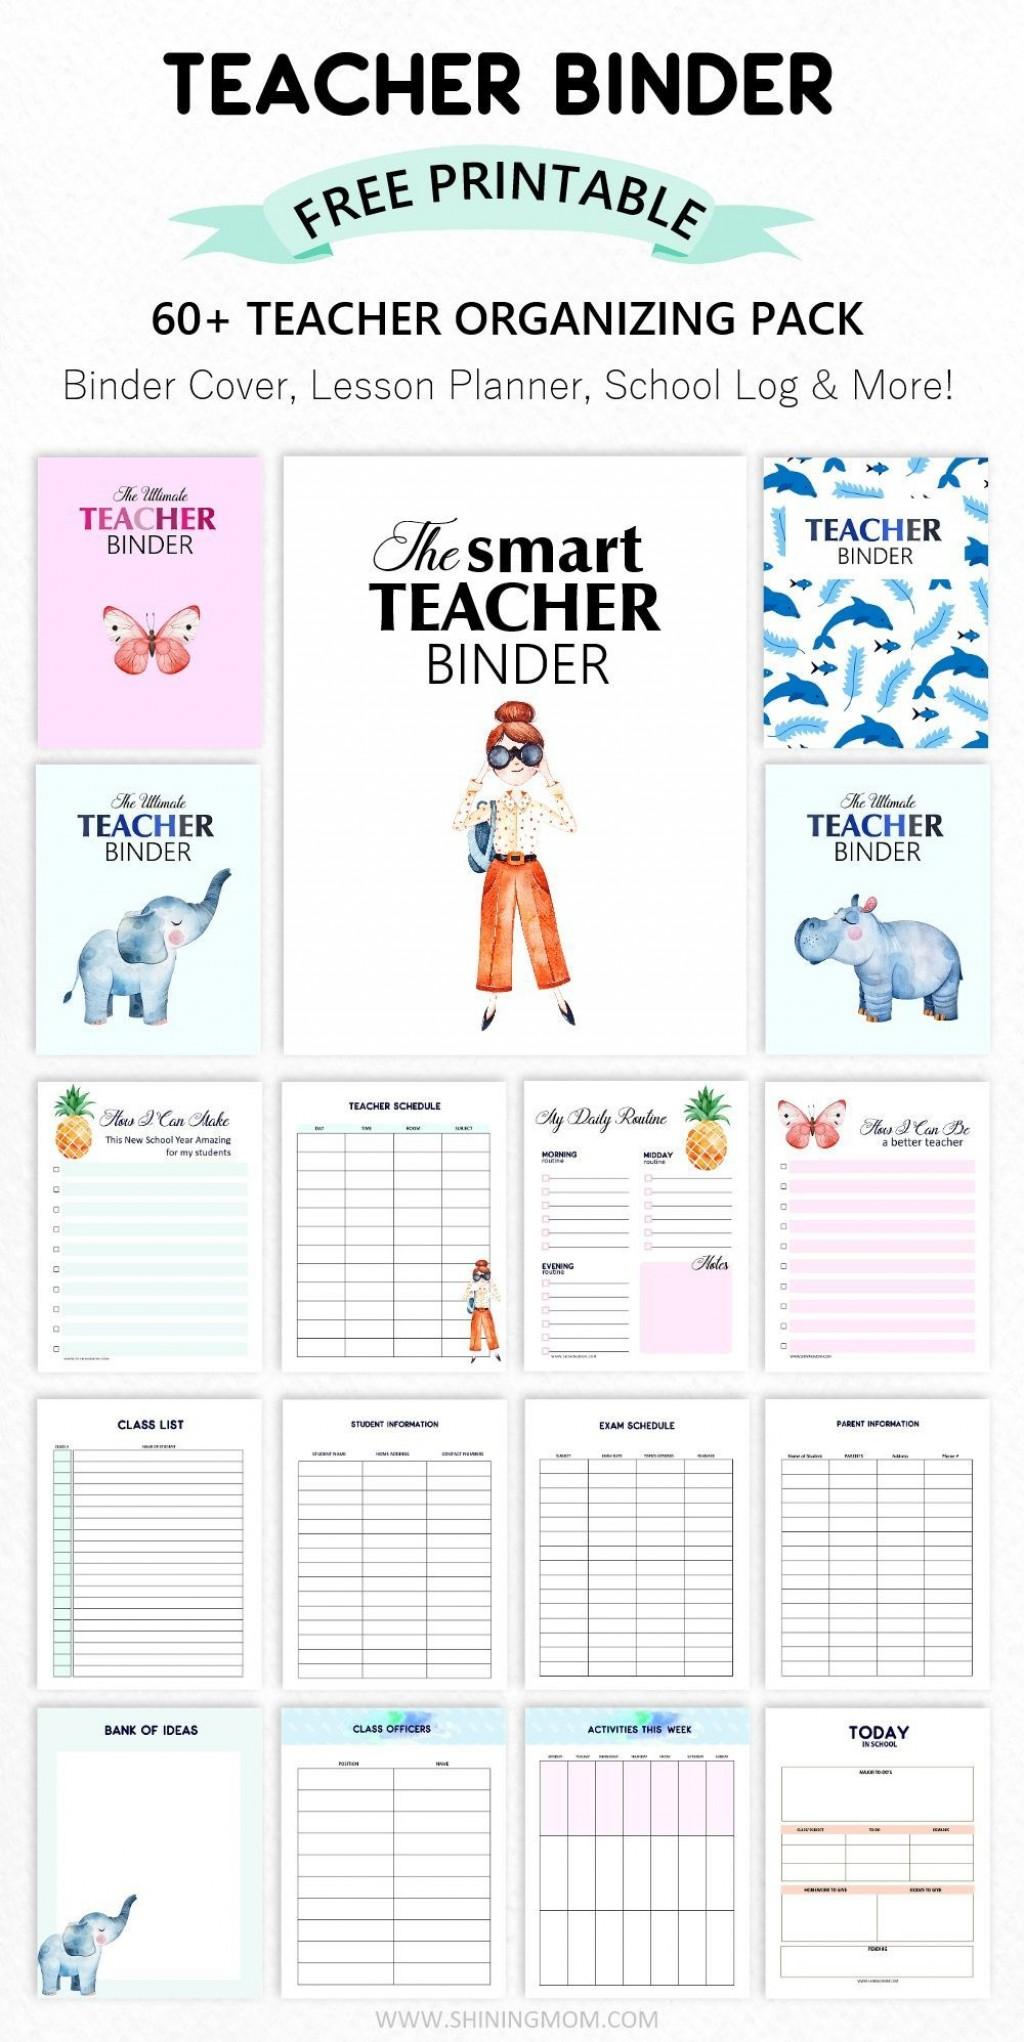 003 Formidable Free Printable Teacher Binder Template High Resolution  TemplatesLarge